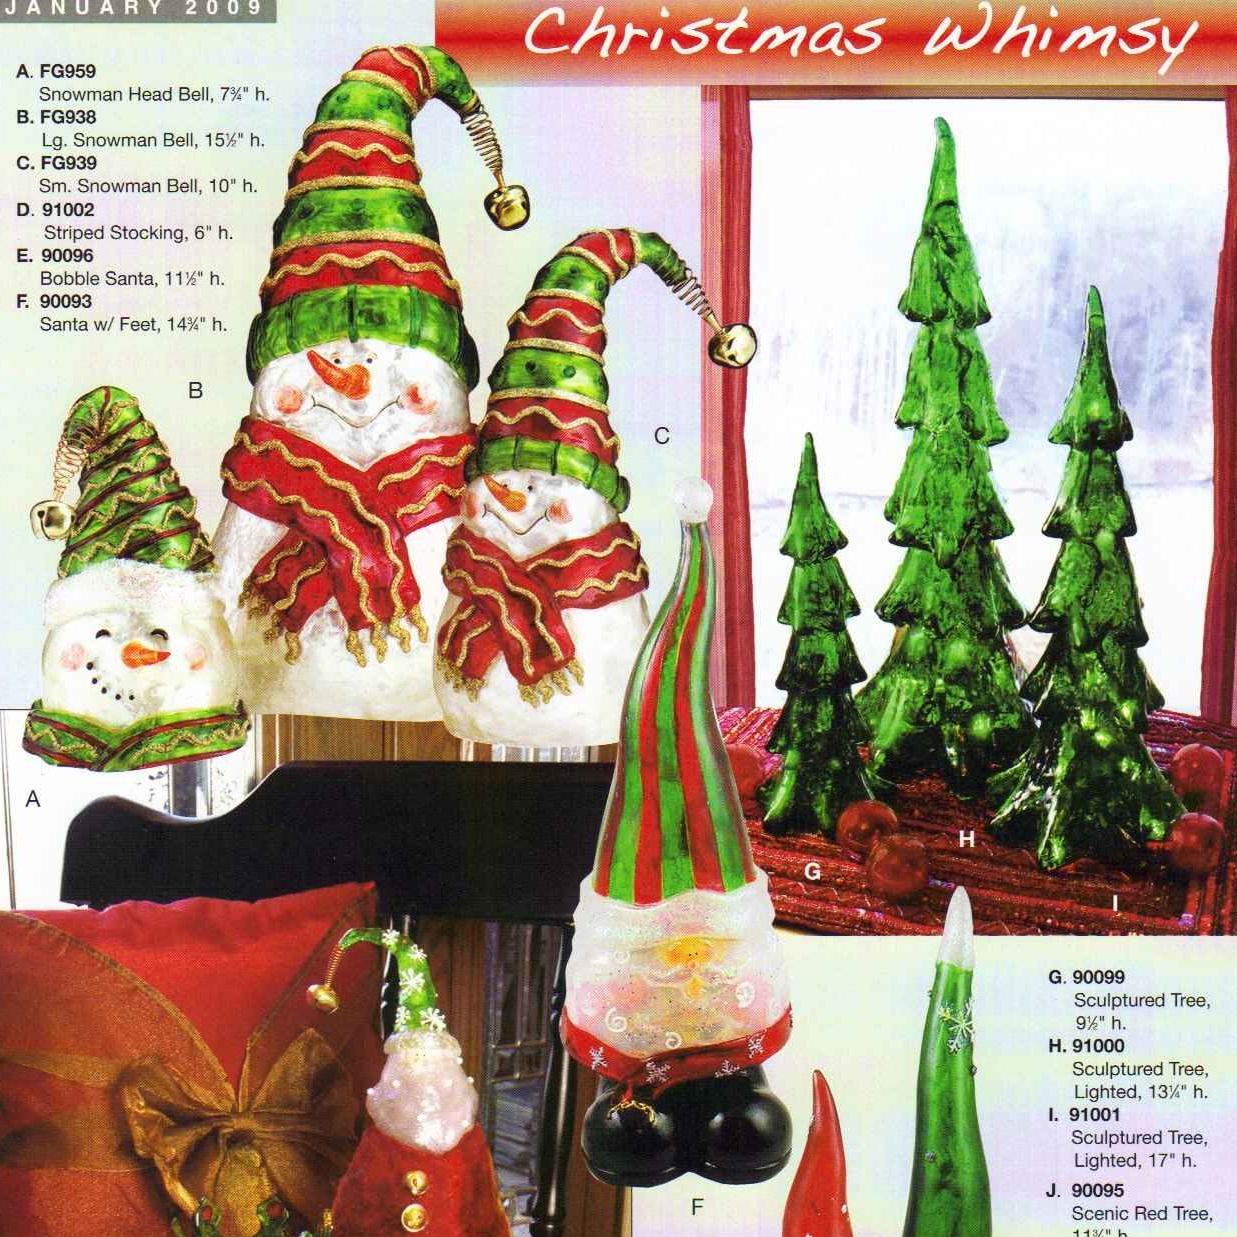 2009 Jan Christmas Whimsy